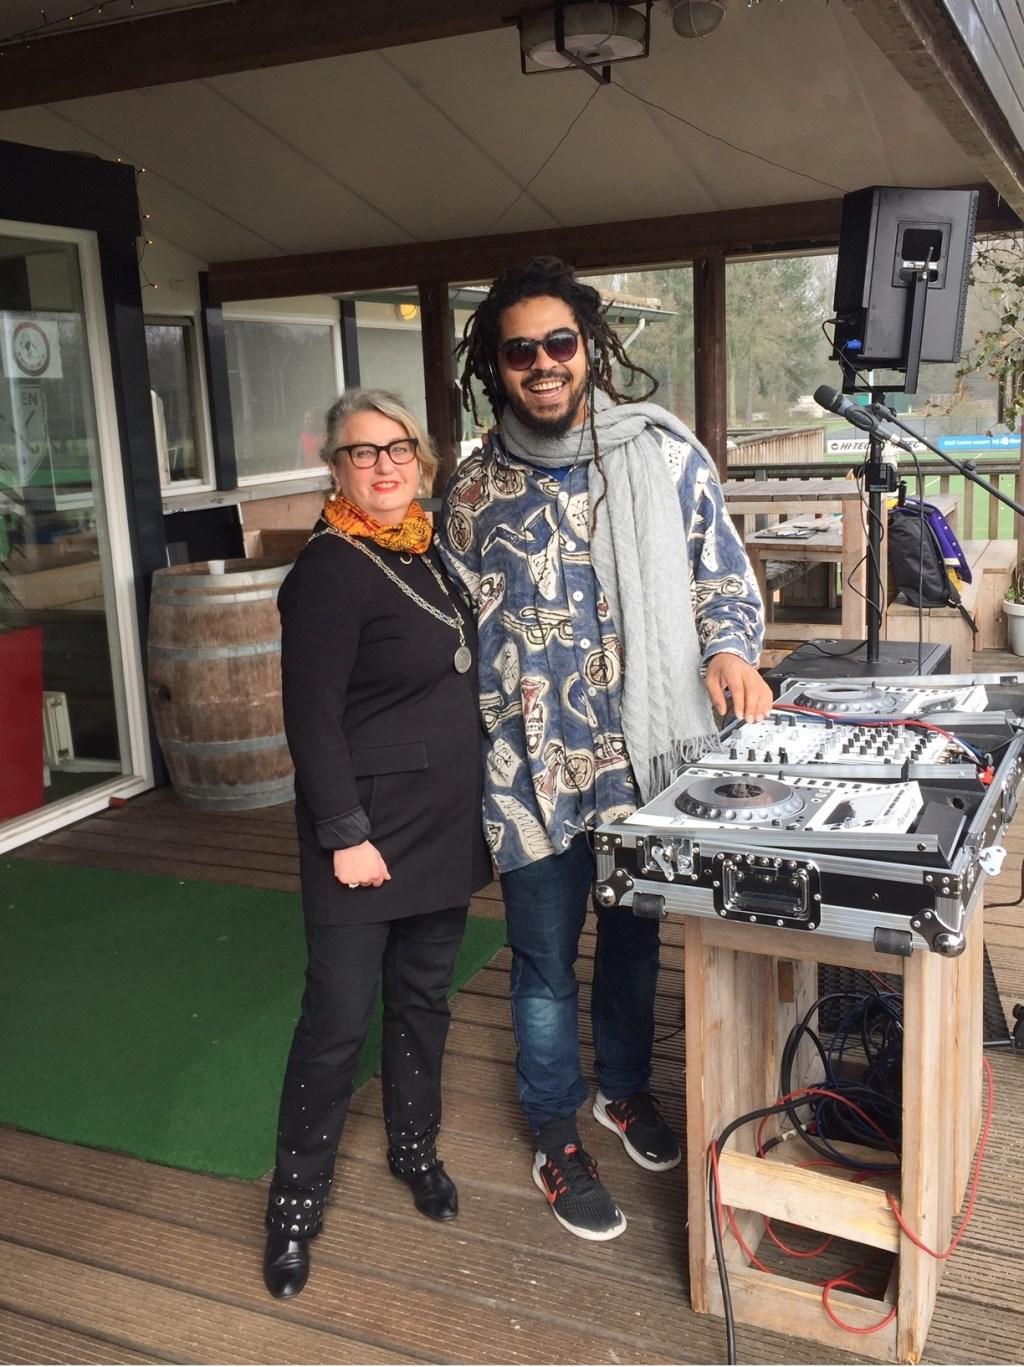 Burgemeester Rinske Kruisinga met DJ Sean Bogaers van Dynamic Arts. Foto: Rotary © Enter Media